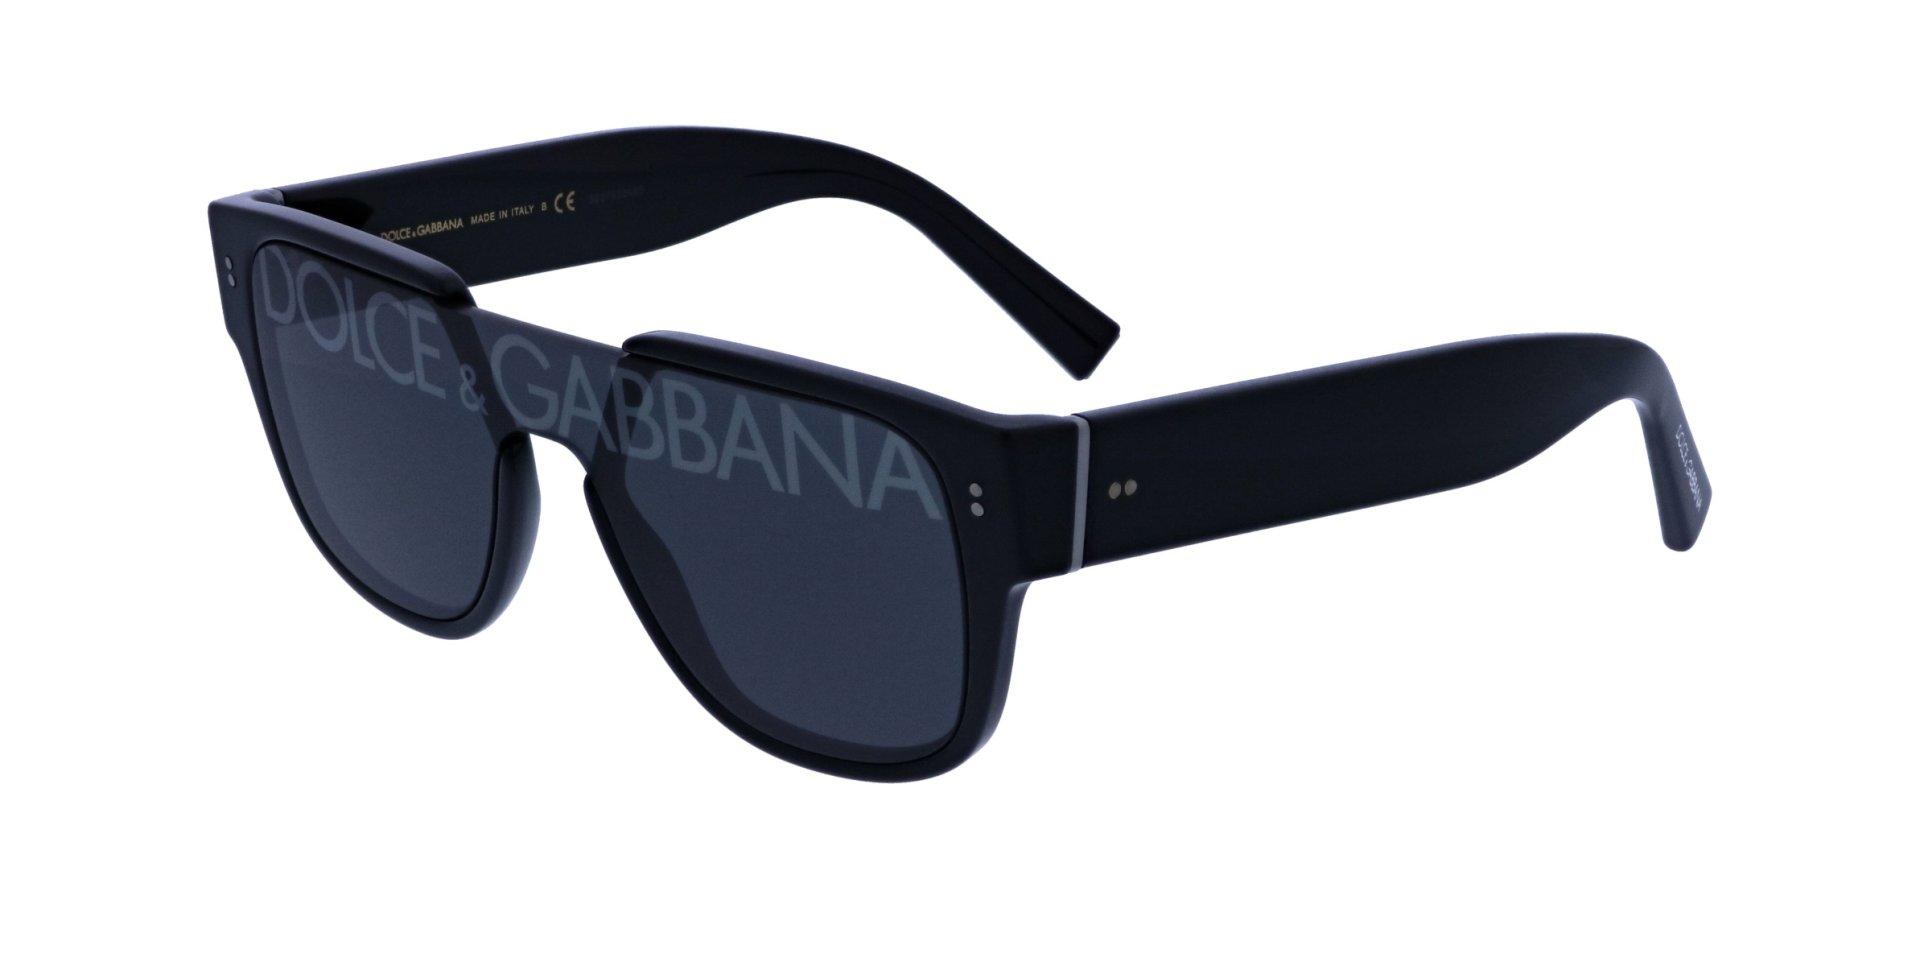 DOLCE&GABBANA DG4356 501/M